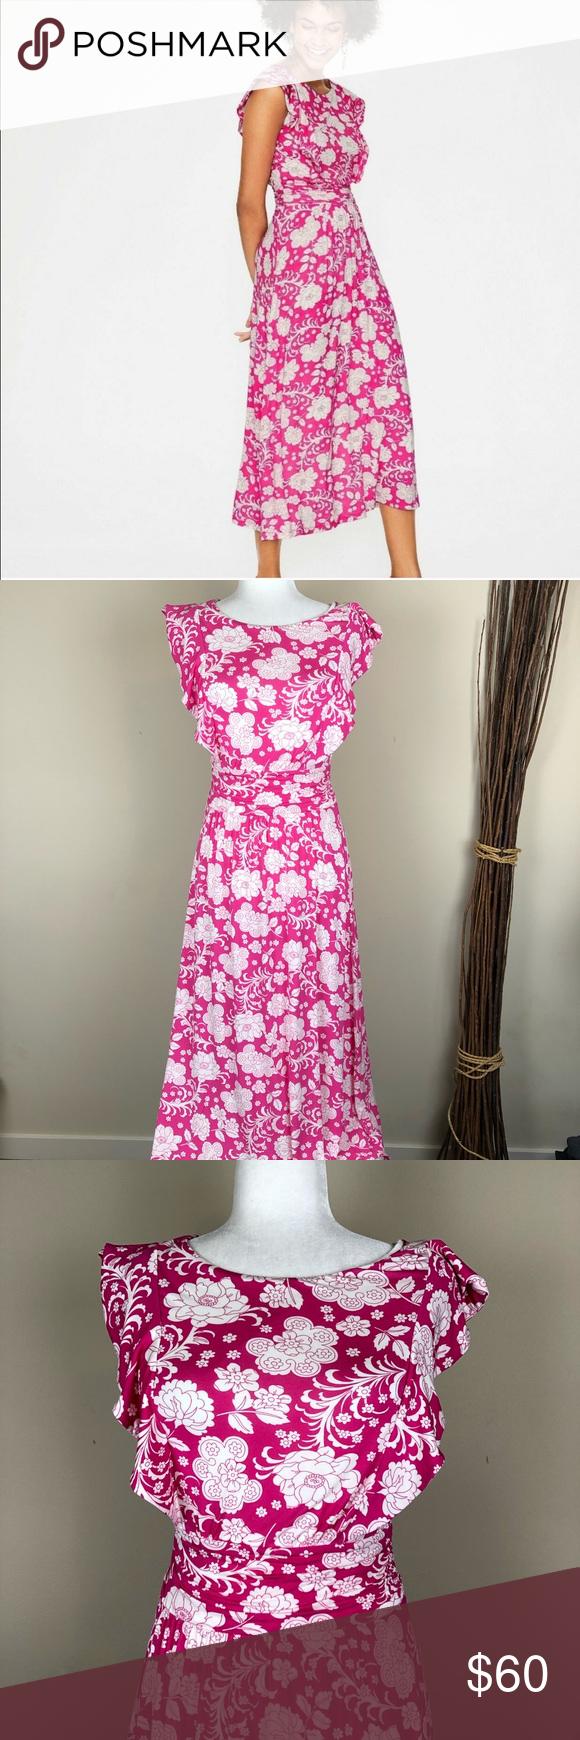 BODEN | Pink + White Floral Midi Dress Jersey 6